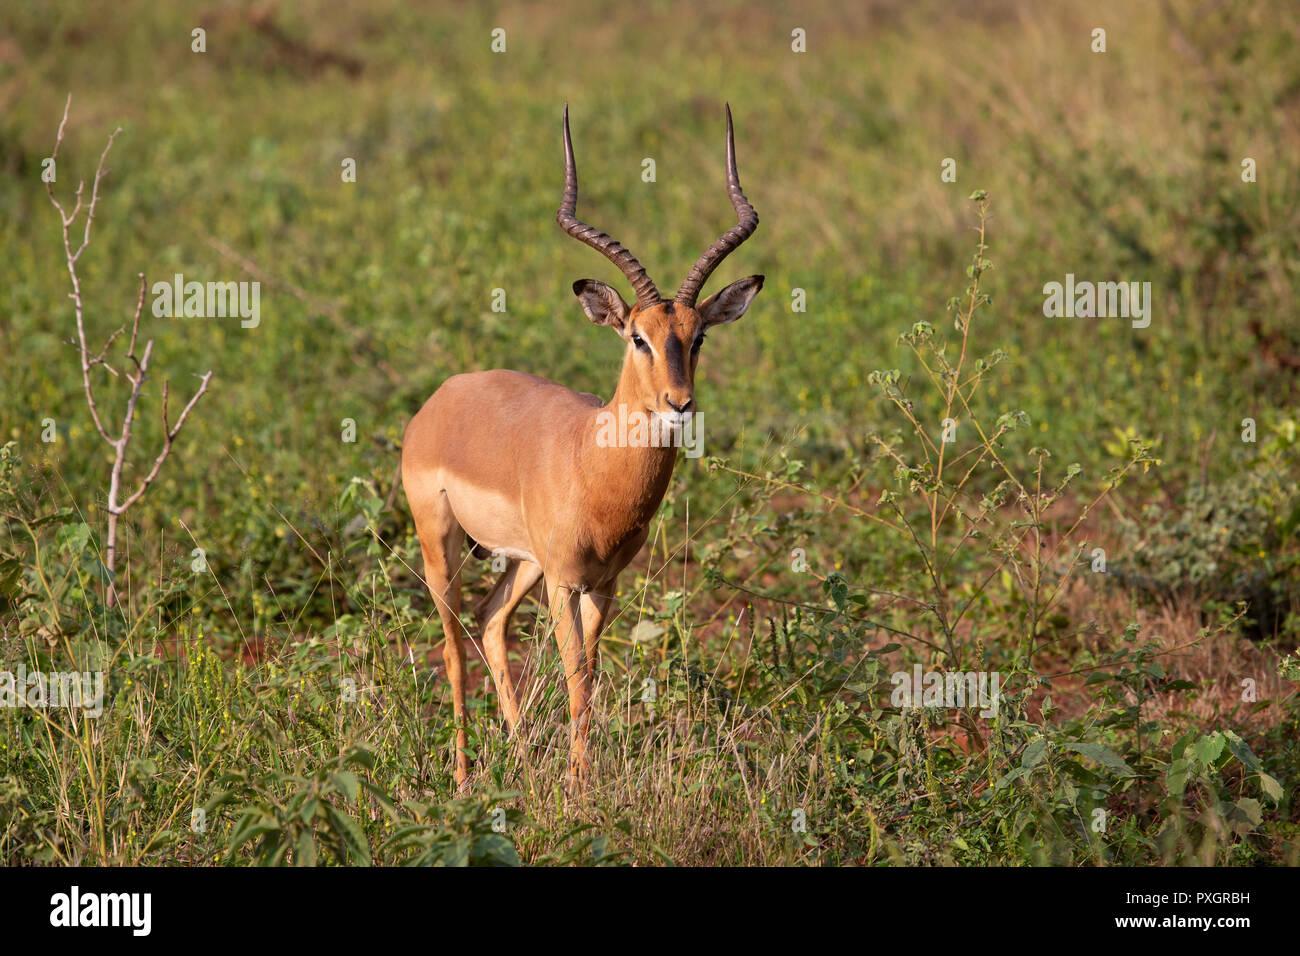 Impala Ram Aepyceros melampus in scrubland in South Africa - Stock Image